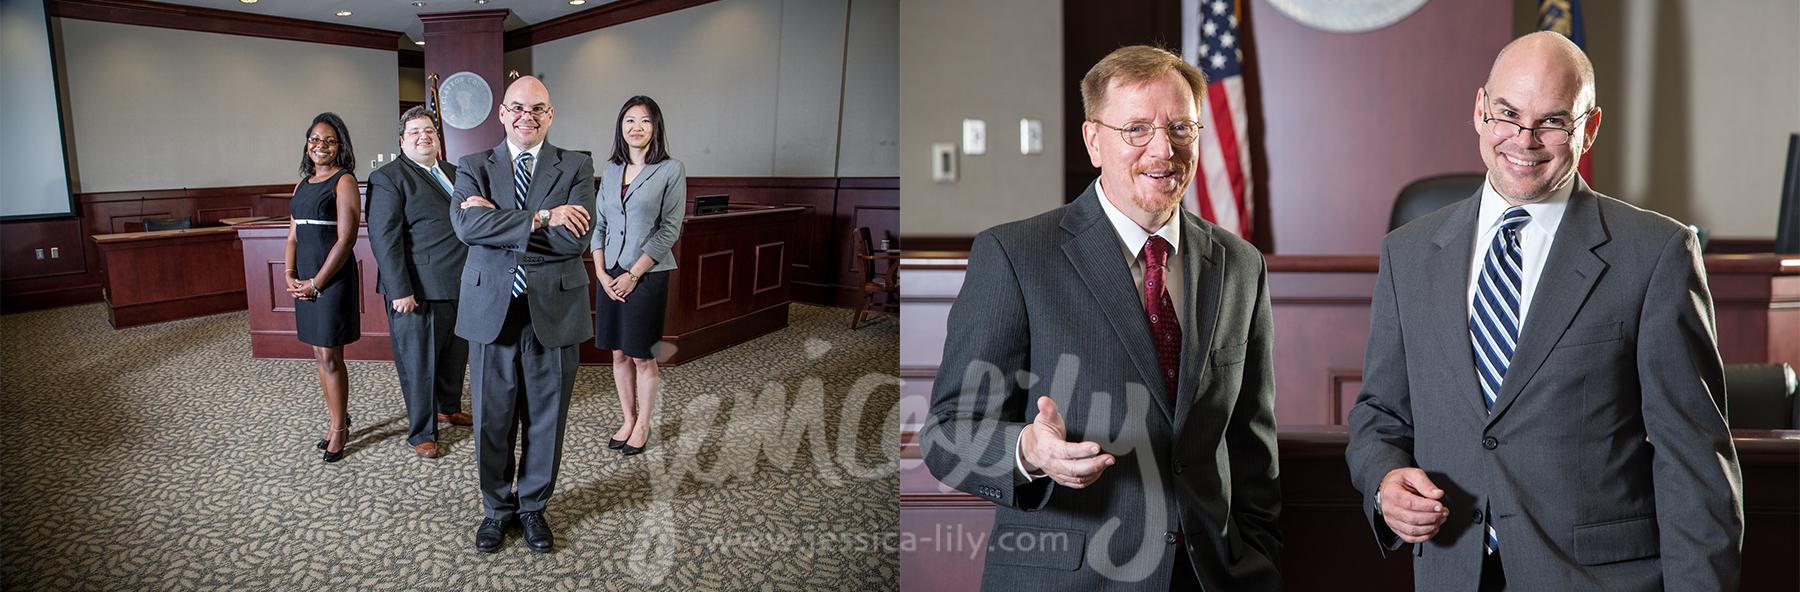 Professional Headshot- Millar and Mixon, LLC. Injury Attorneys